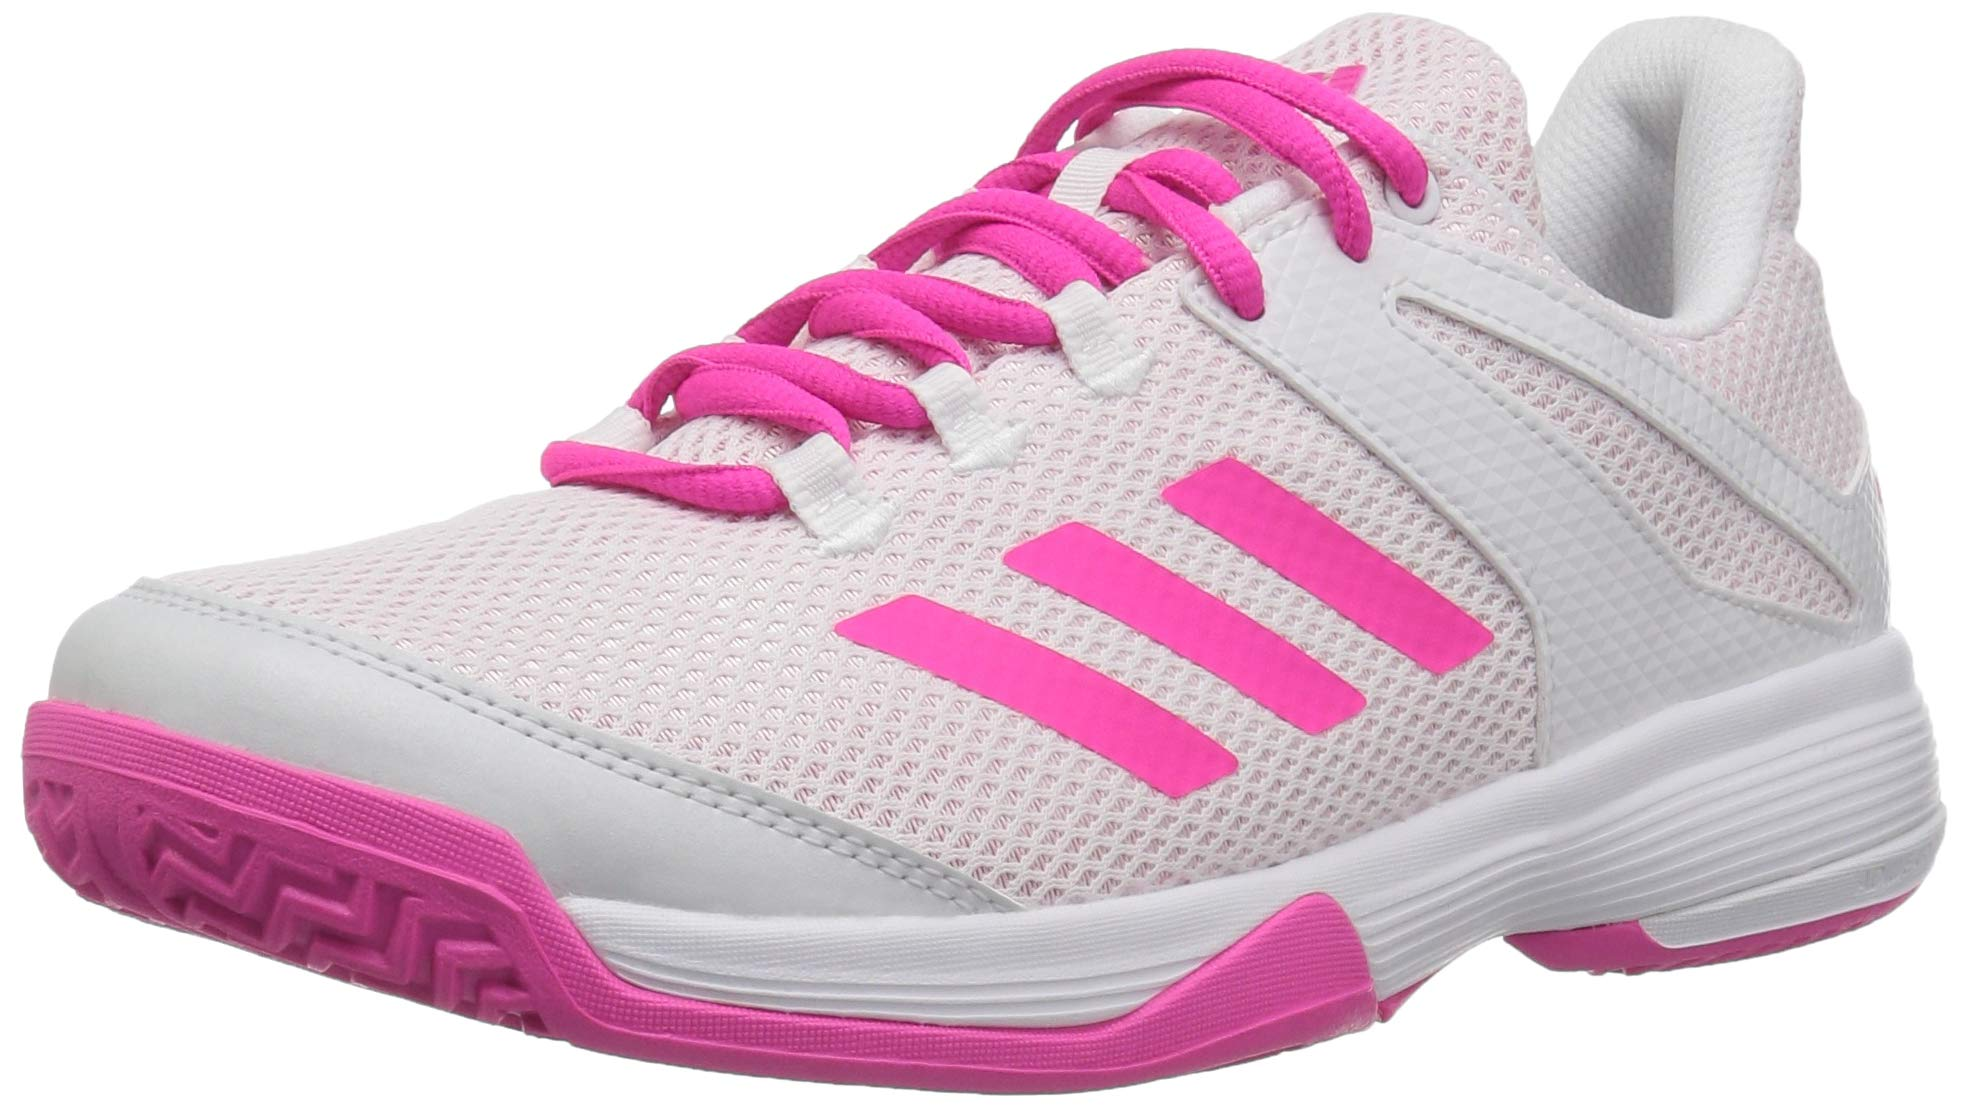 adidas Unisex Adizero Club Running Shoe Shock Pink/White, 6.5 M US Big Kid